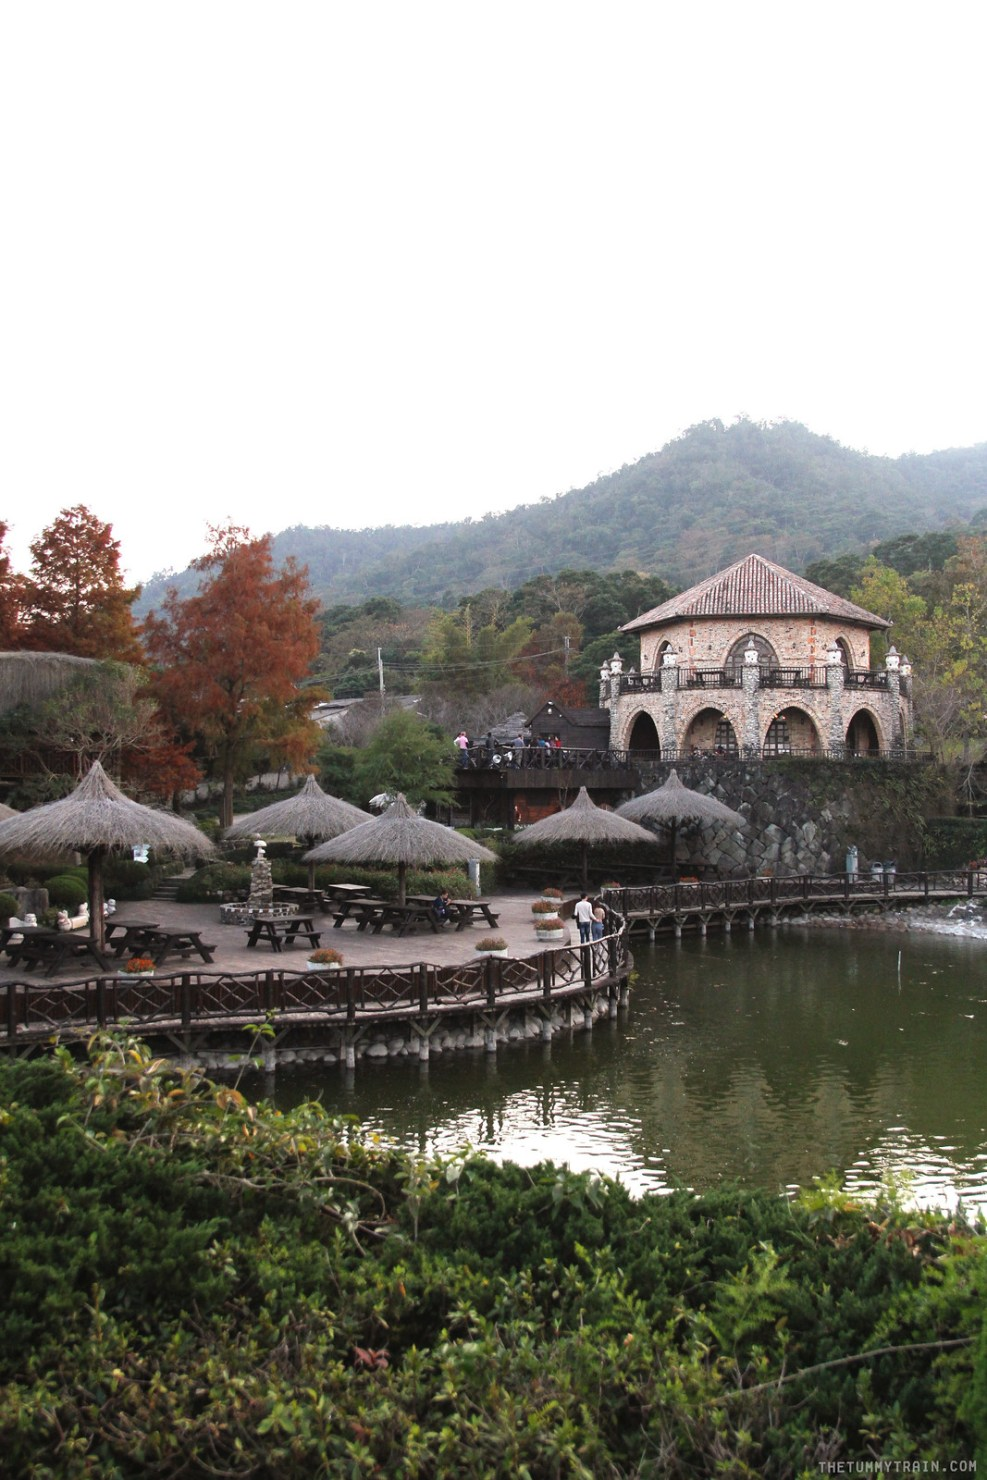 Taiwan Fall Winter 2017 Xinshe Castle At Taichung The Tummy Train